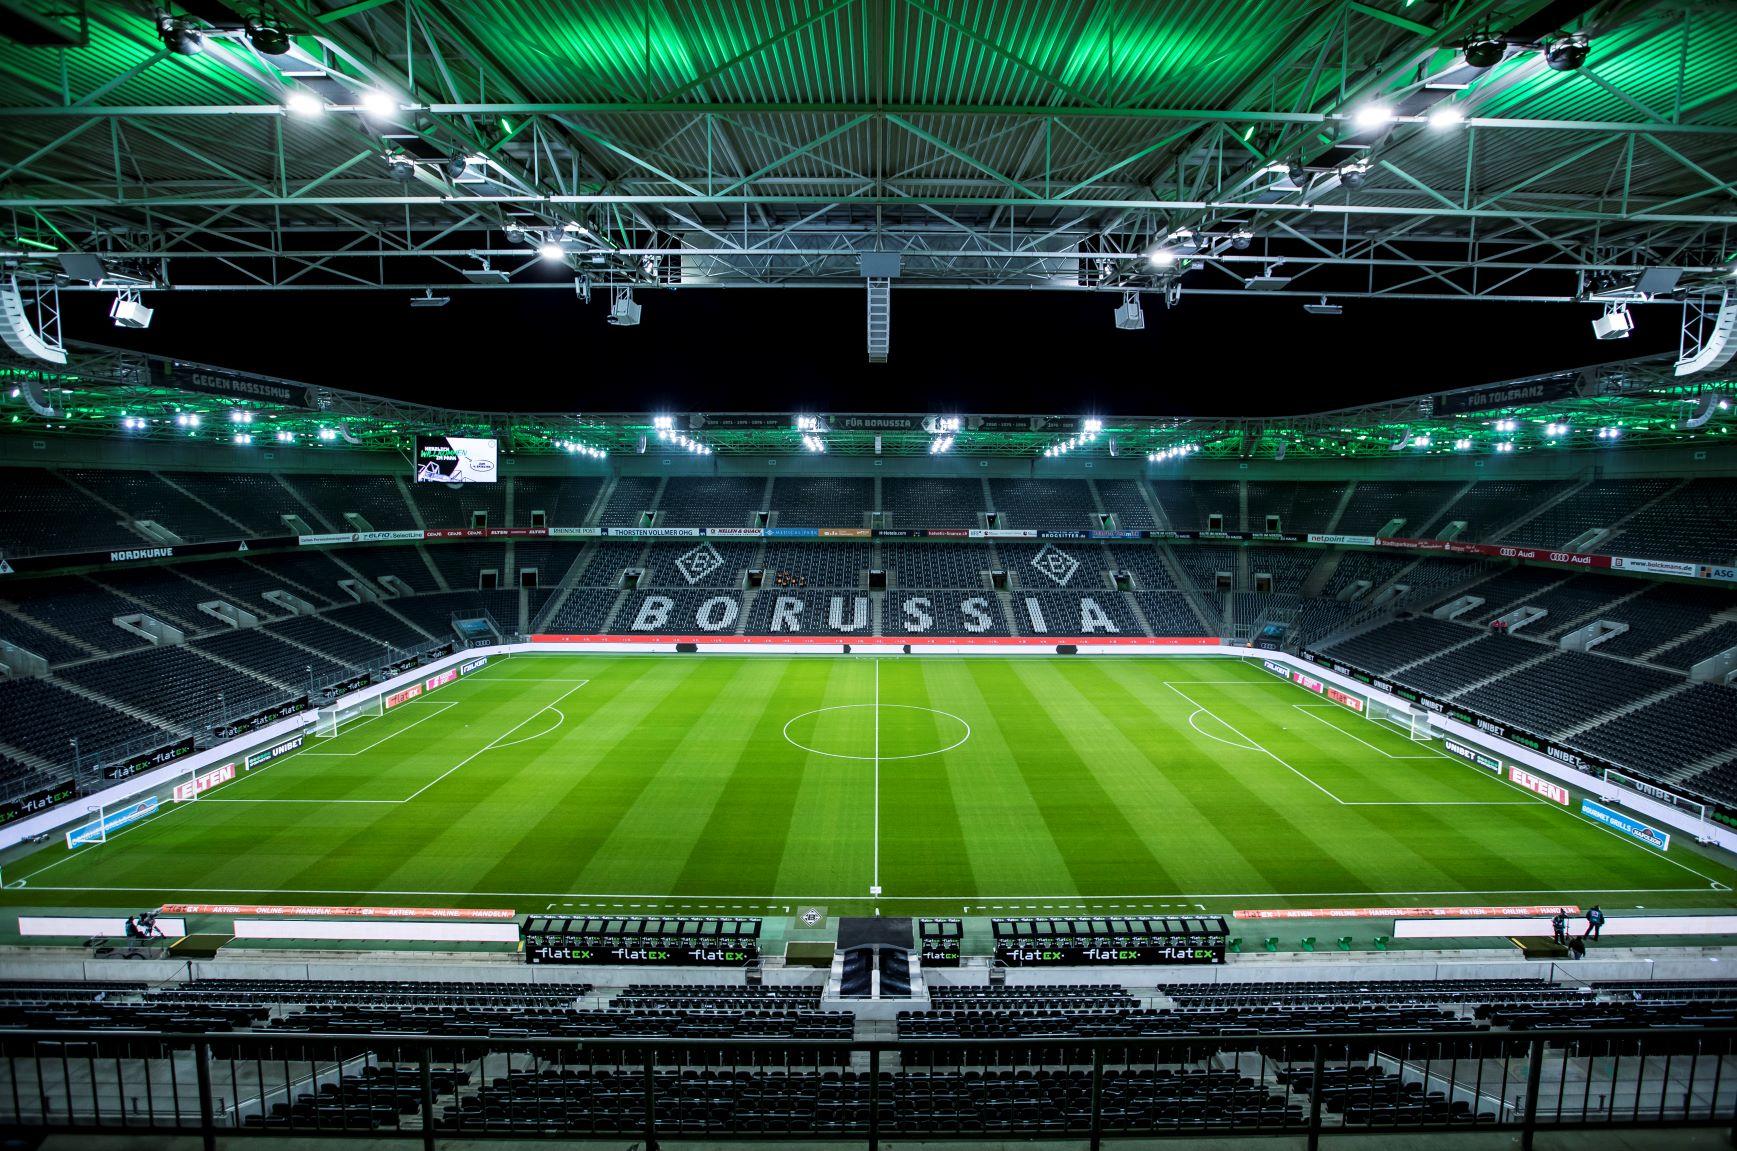 Borussia mönchengladbach digitalisierung